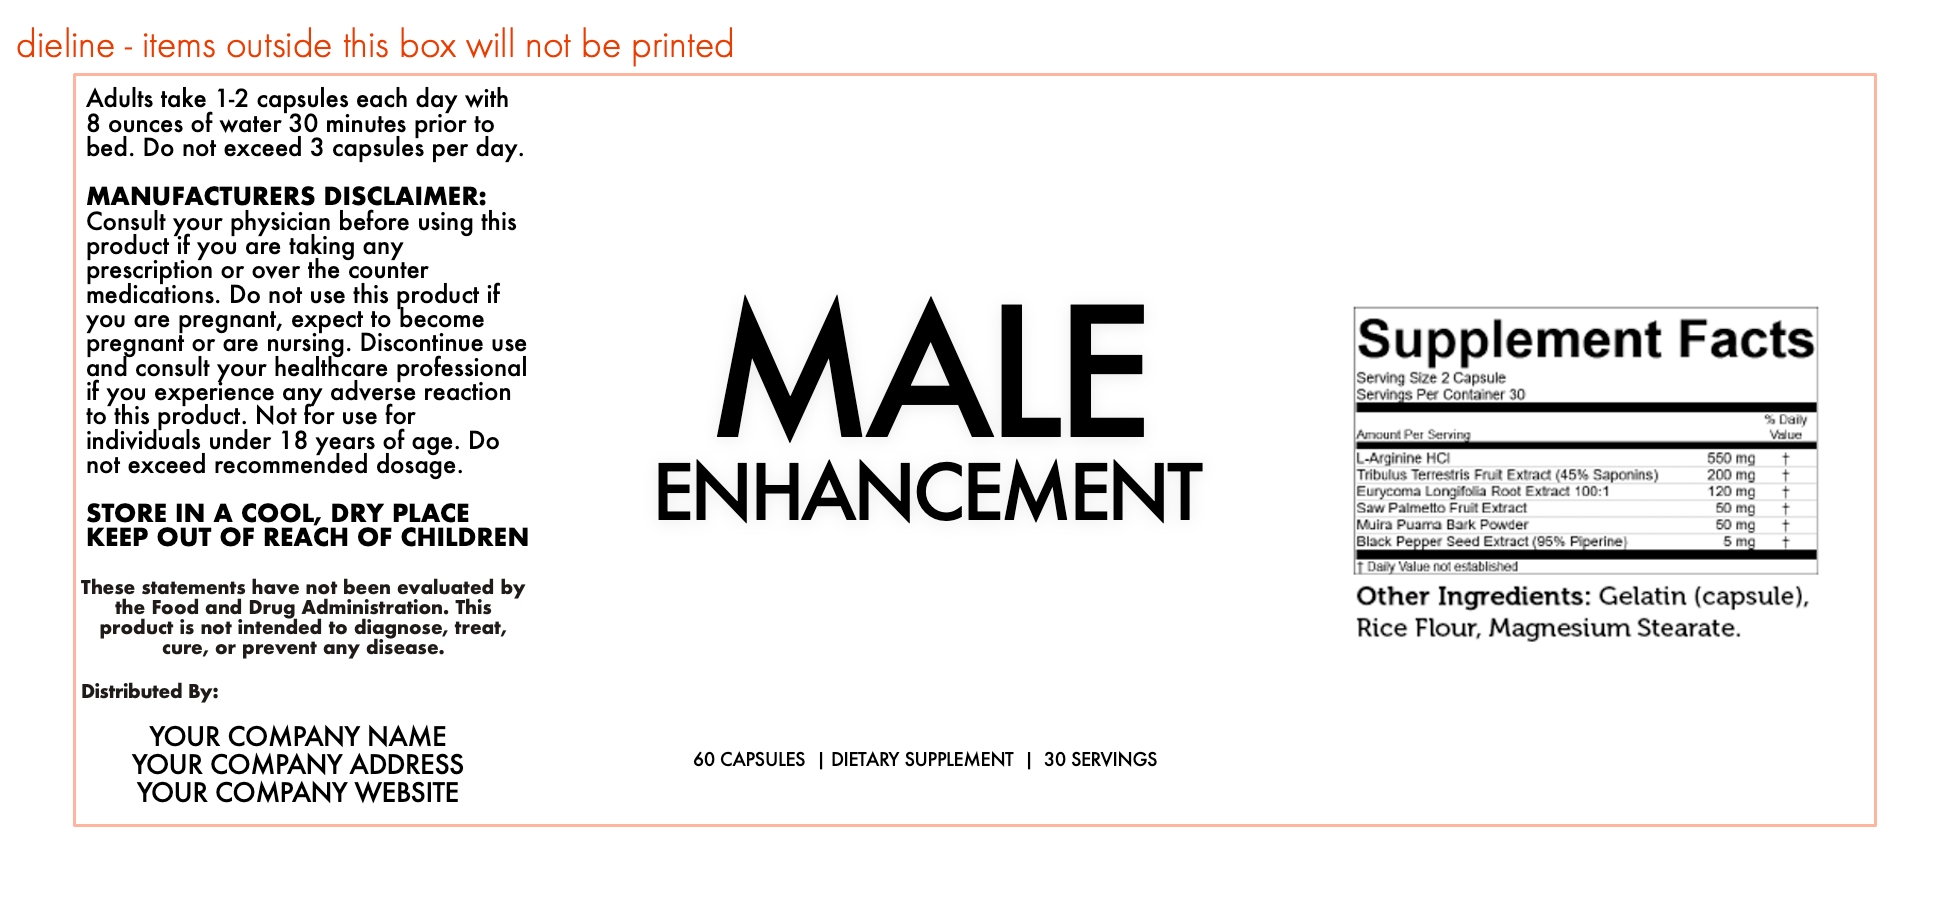 IMN Male Enhance 6x2.5.jpg